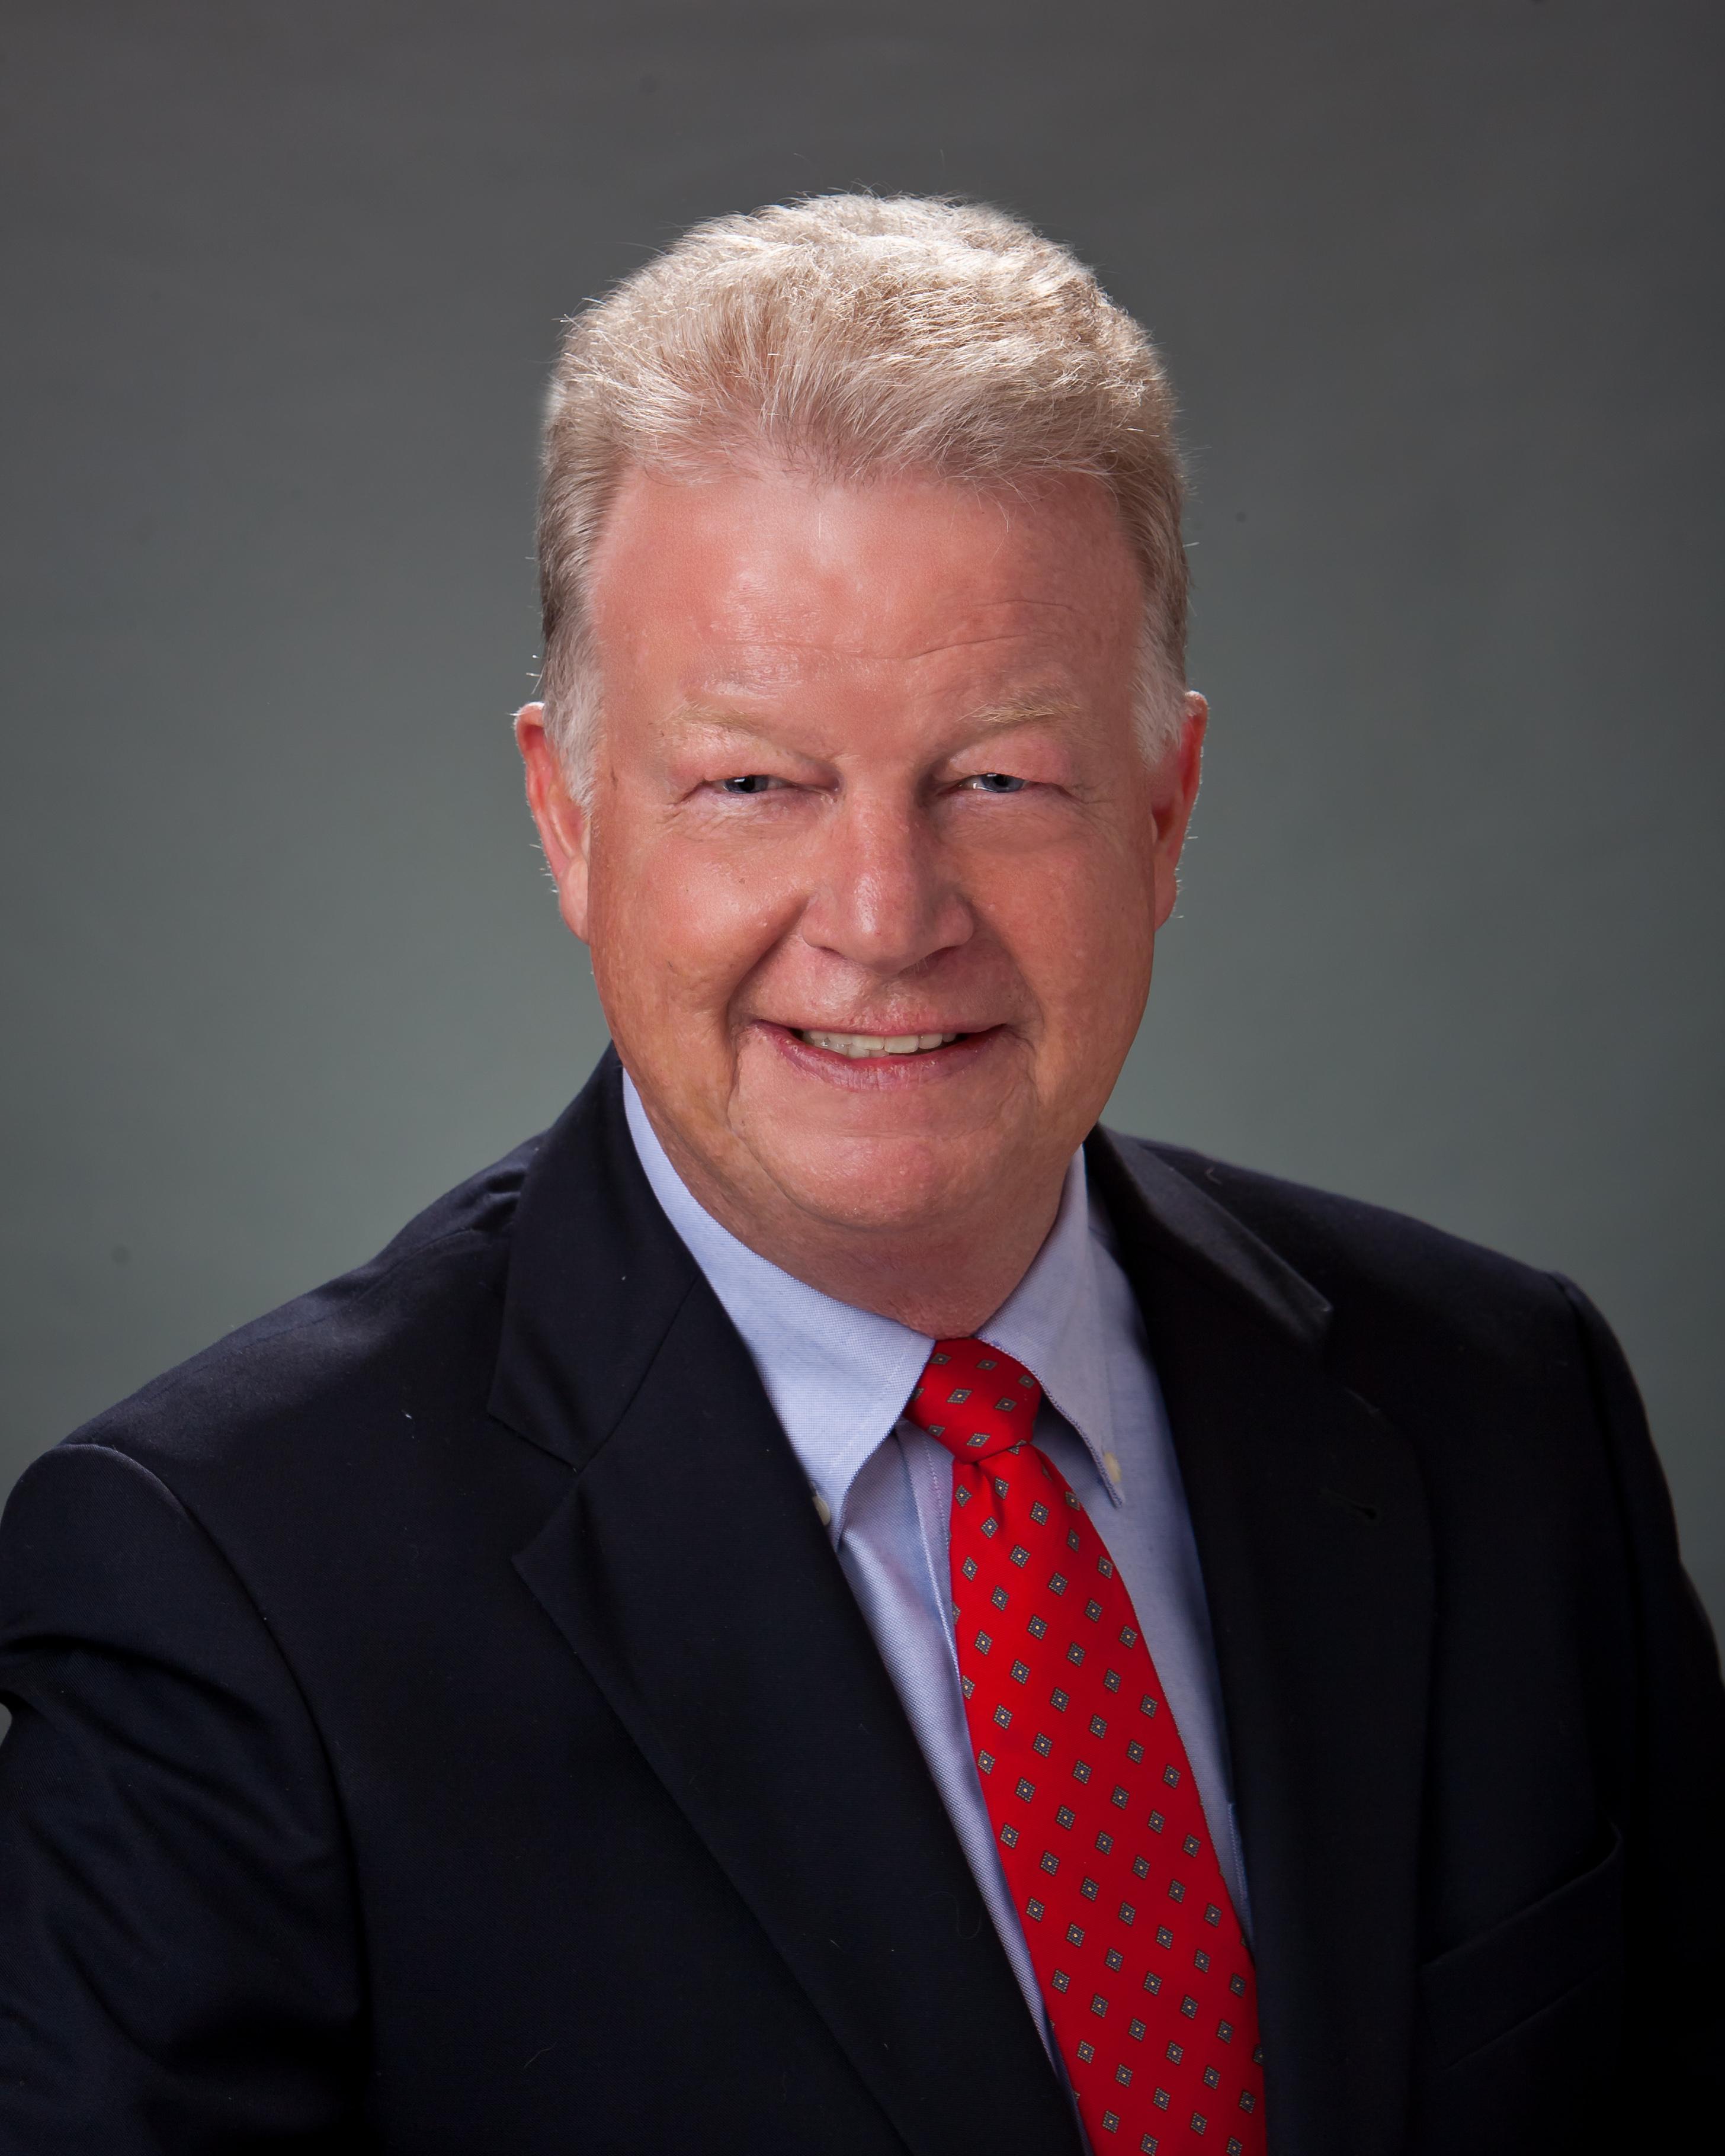 2016 Chairman, David Simpson